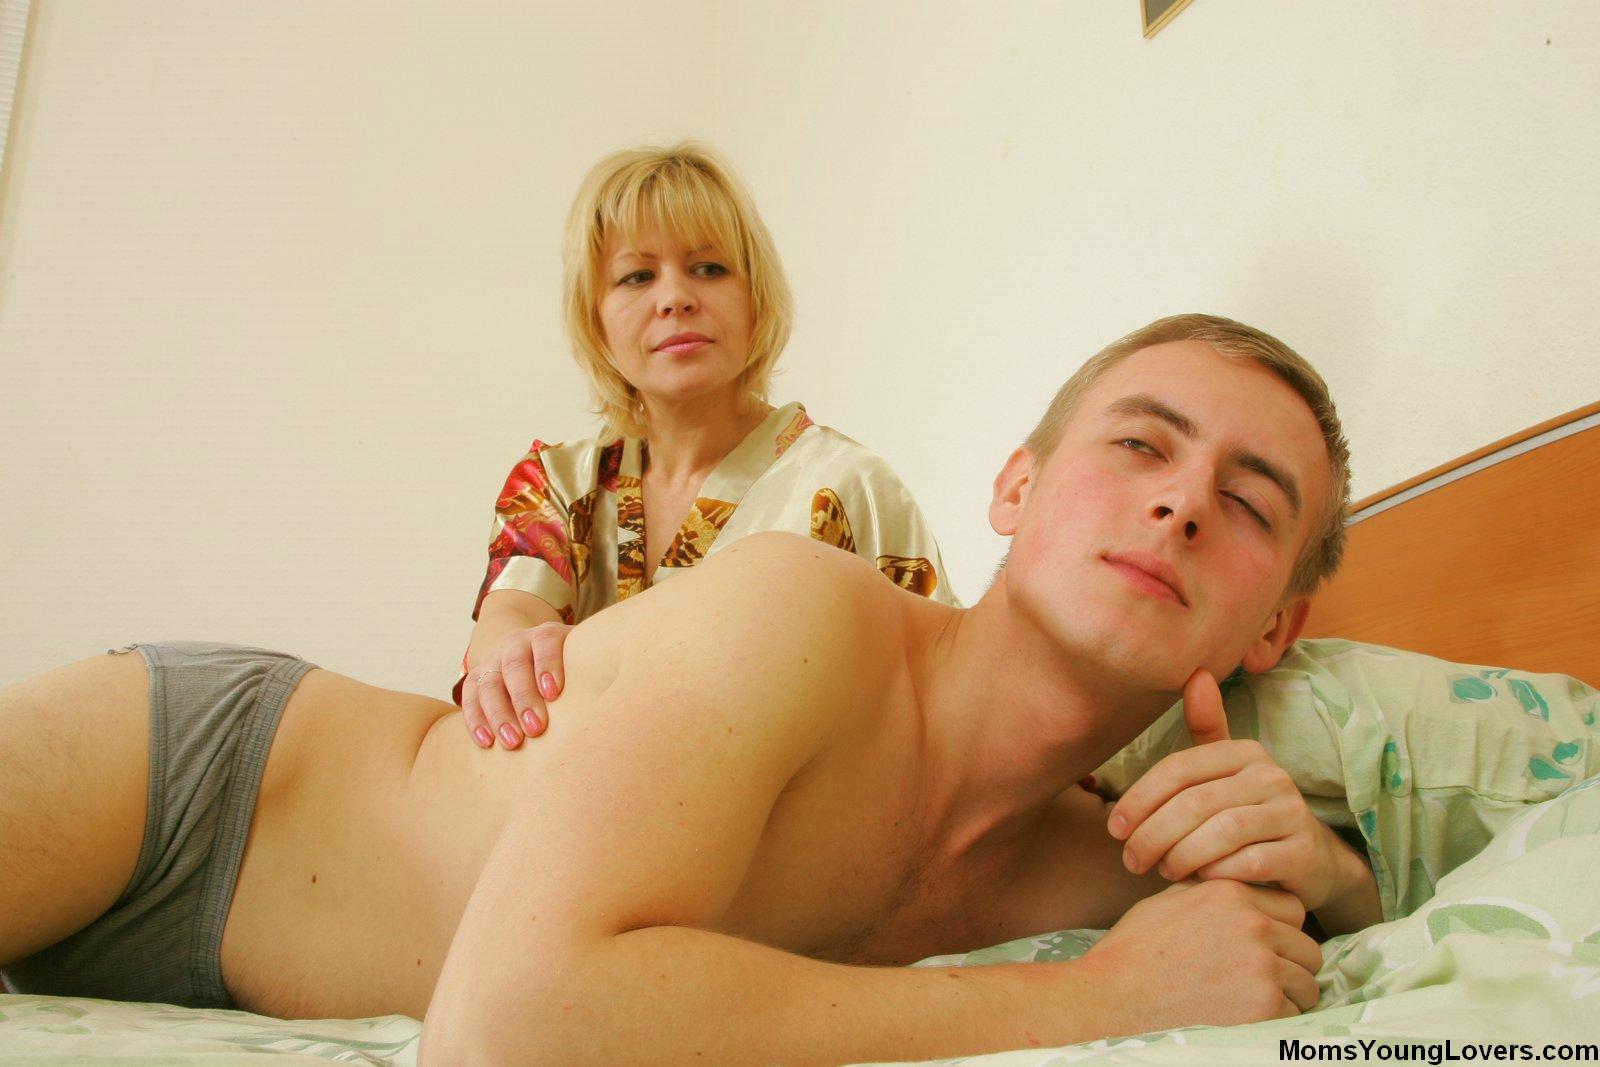 Сын застукал мастурбирующую мать 19 фотография